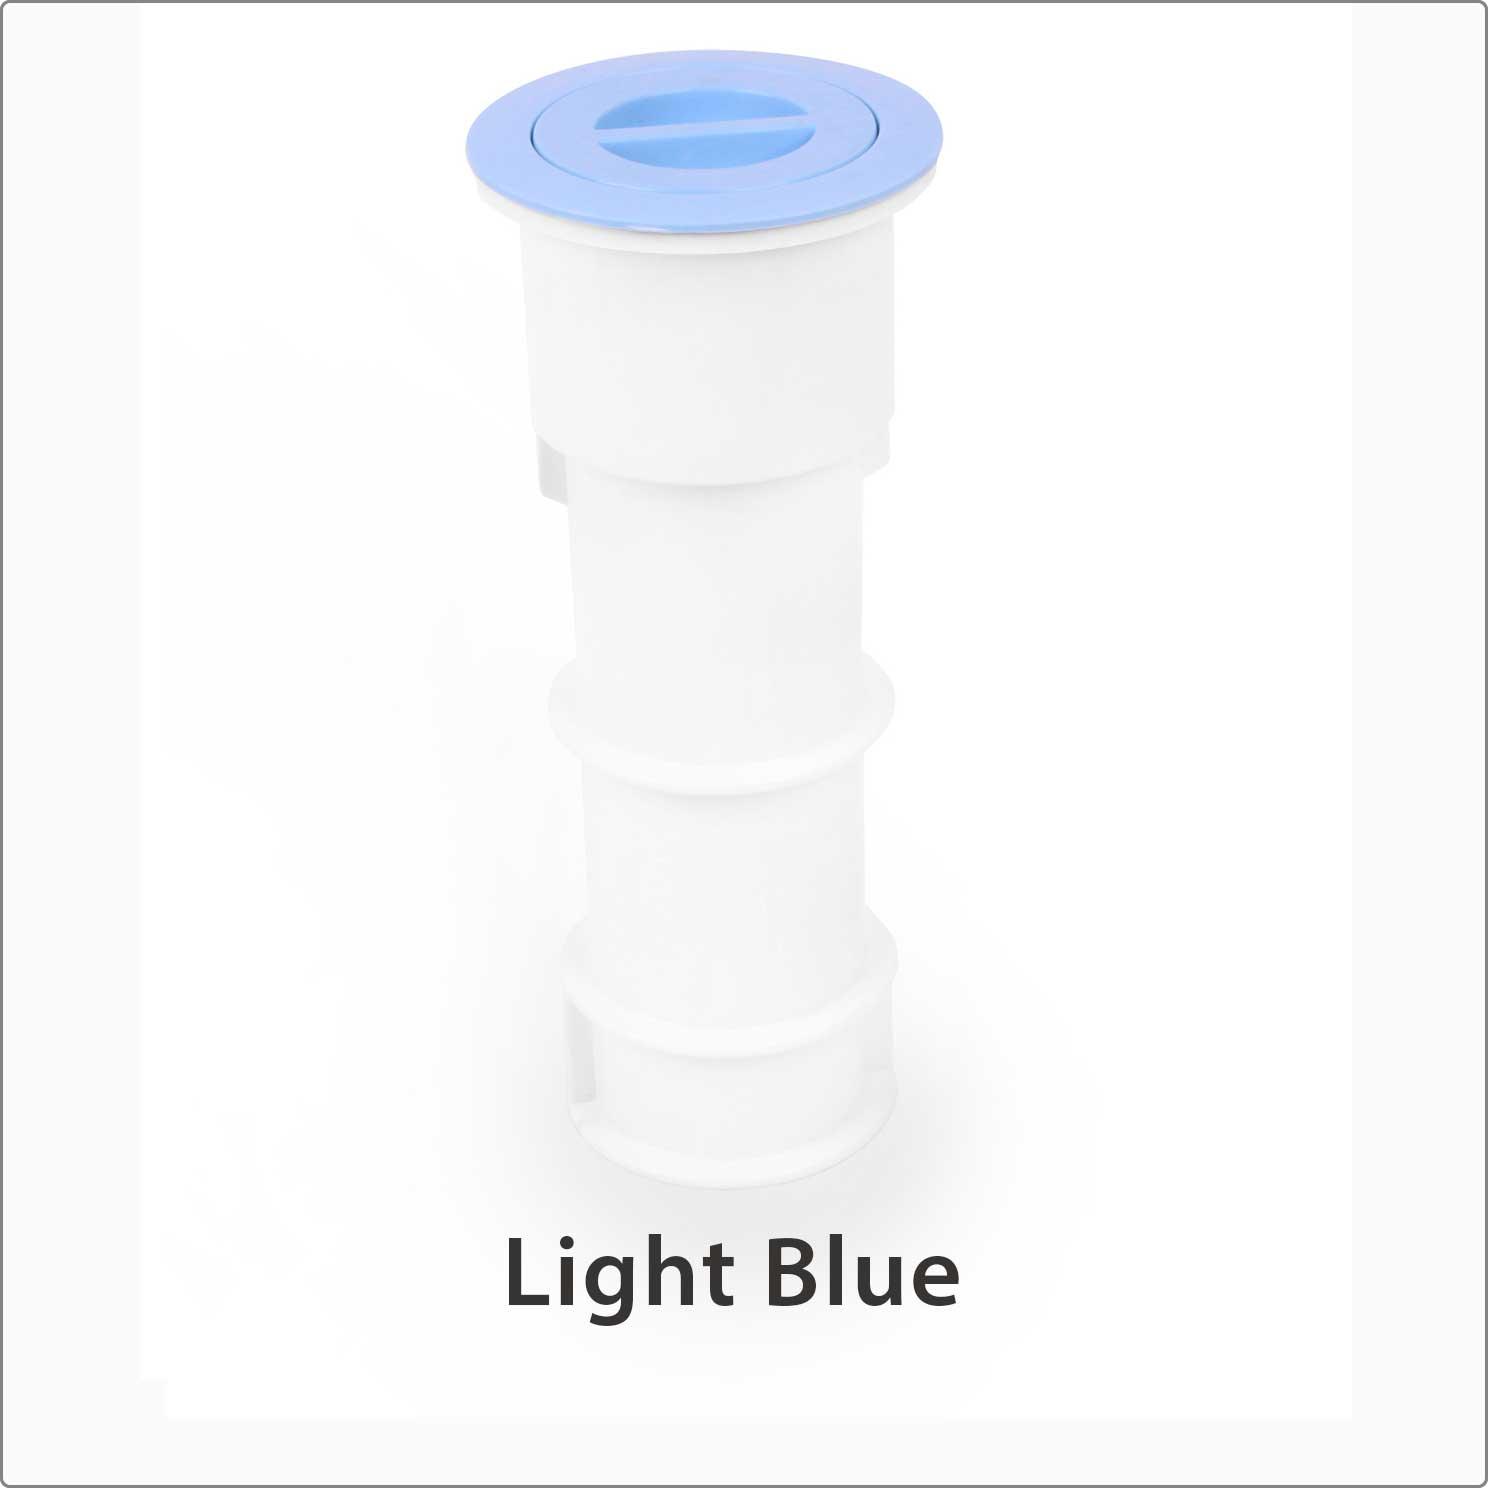 Pole-Holder7-Light-Blue.jpg